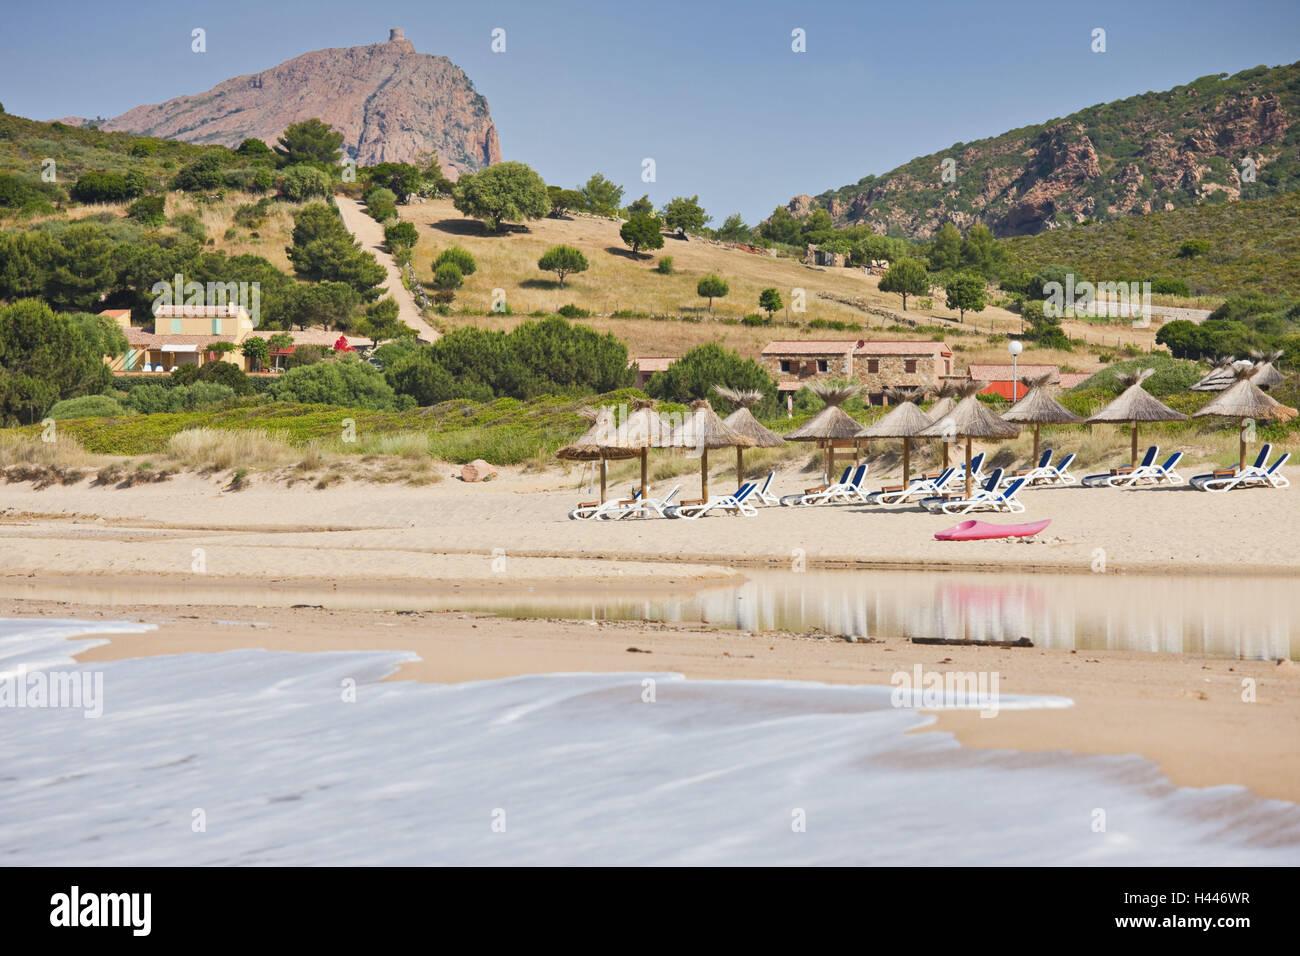 France, Corsica, beach, Capu Rossu, pest d'Arone, display screens, - Stock Image